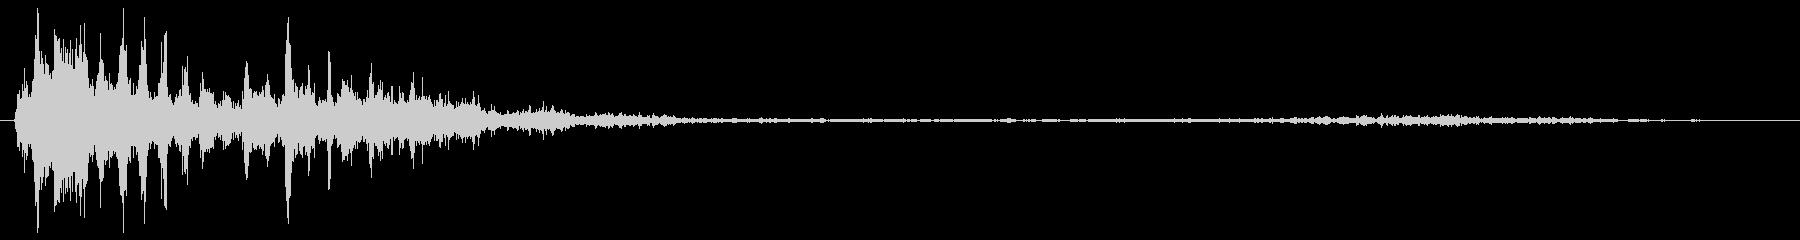 SCIFI GUNSHOT_04の未再生の波形